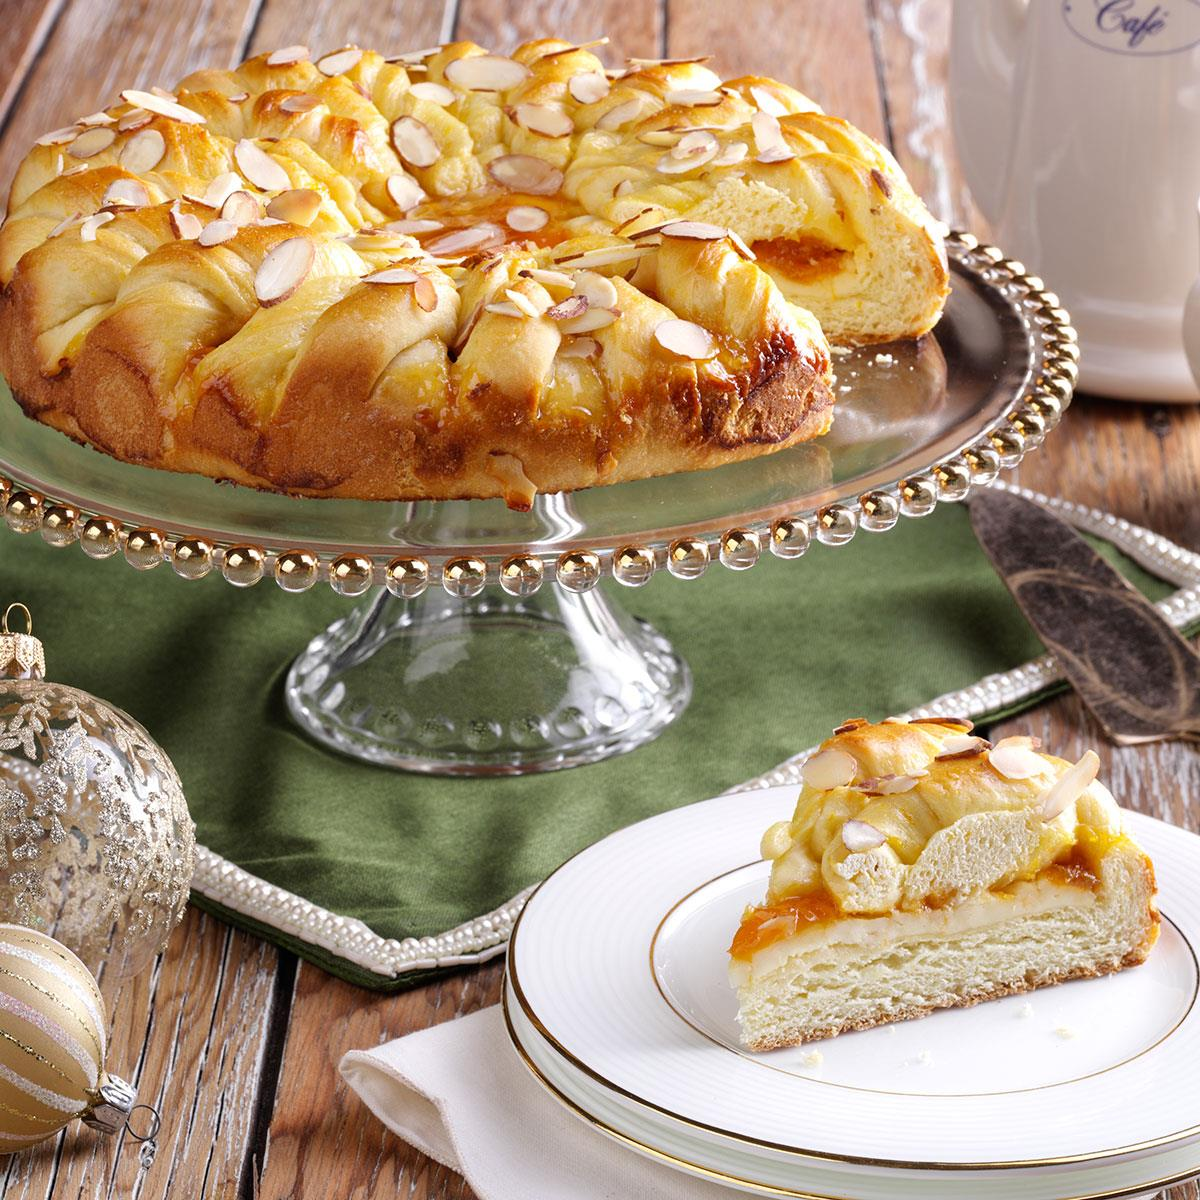 Taste Of Home Almond Apricot Coffee Cake